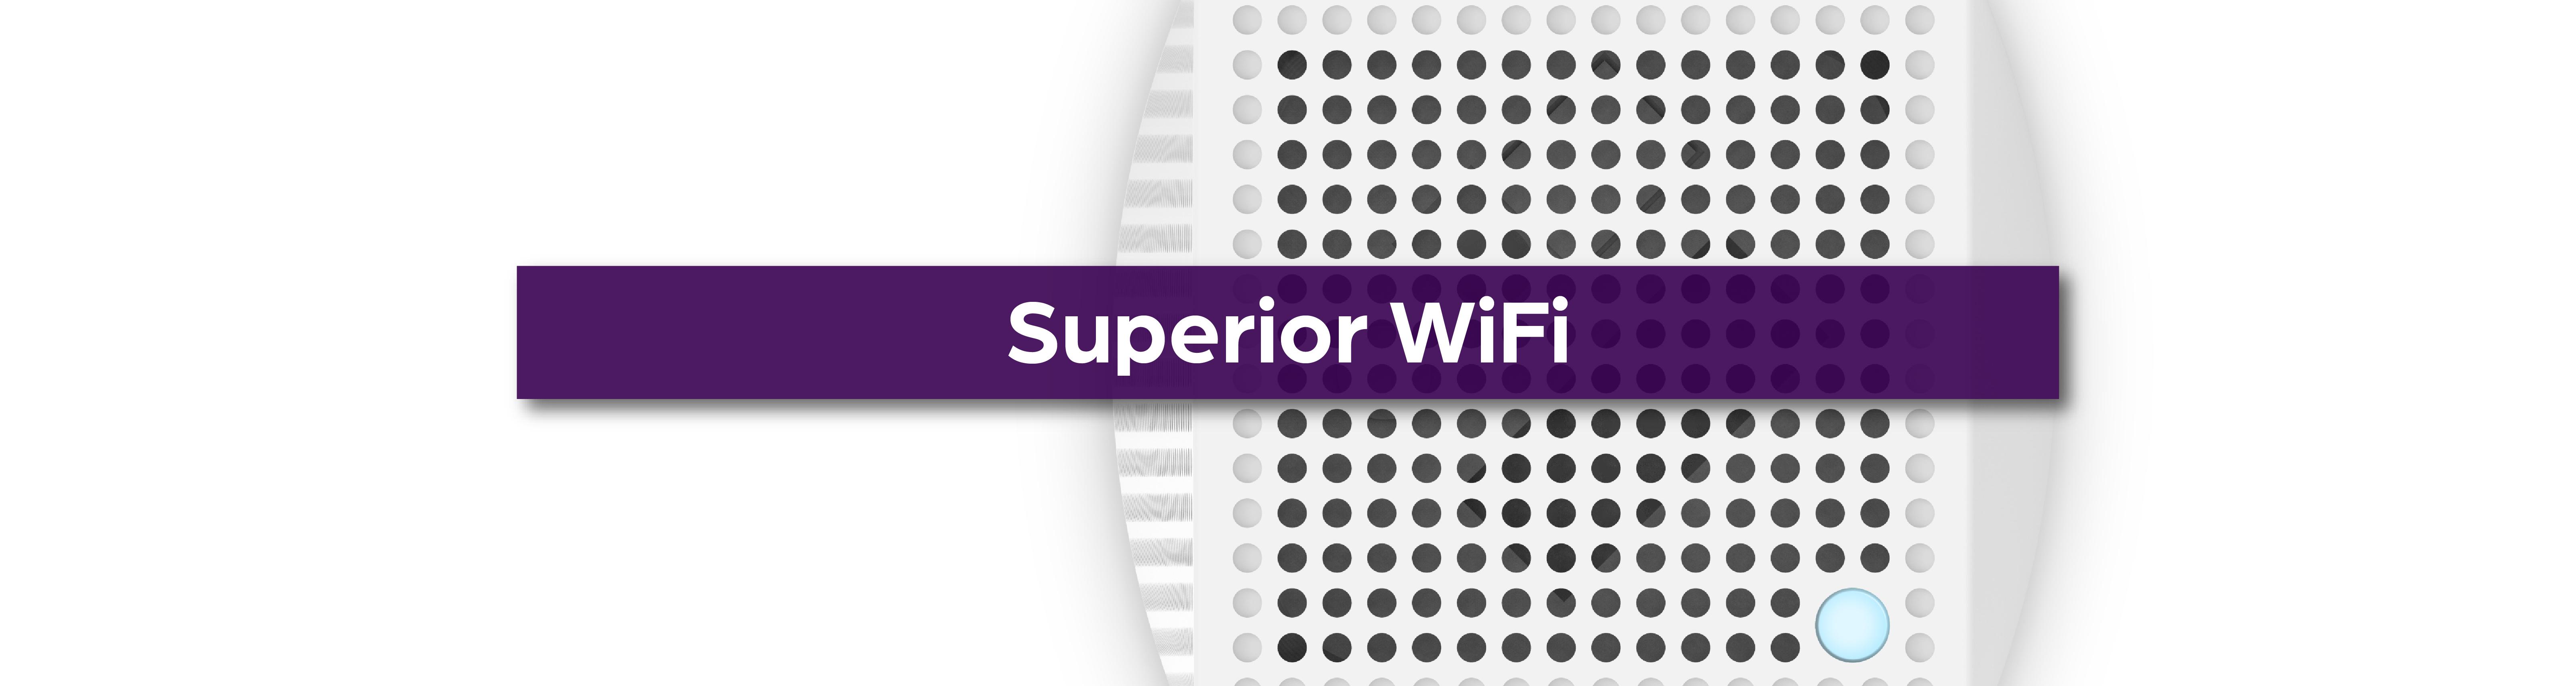 superior_wifi_hero